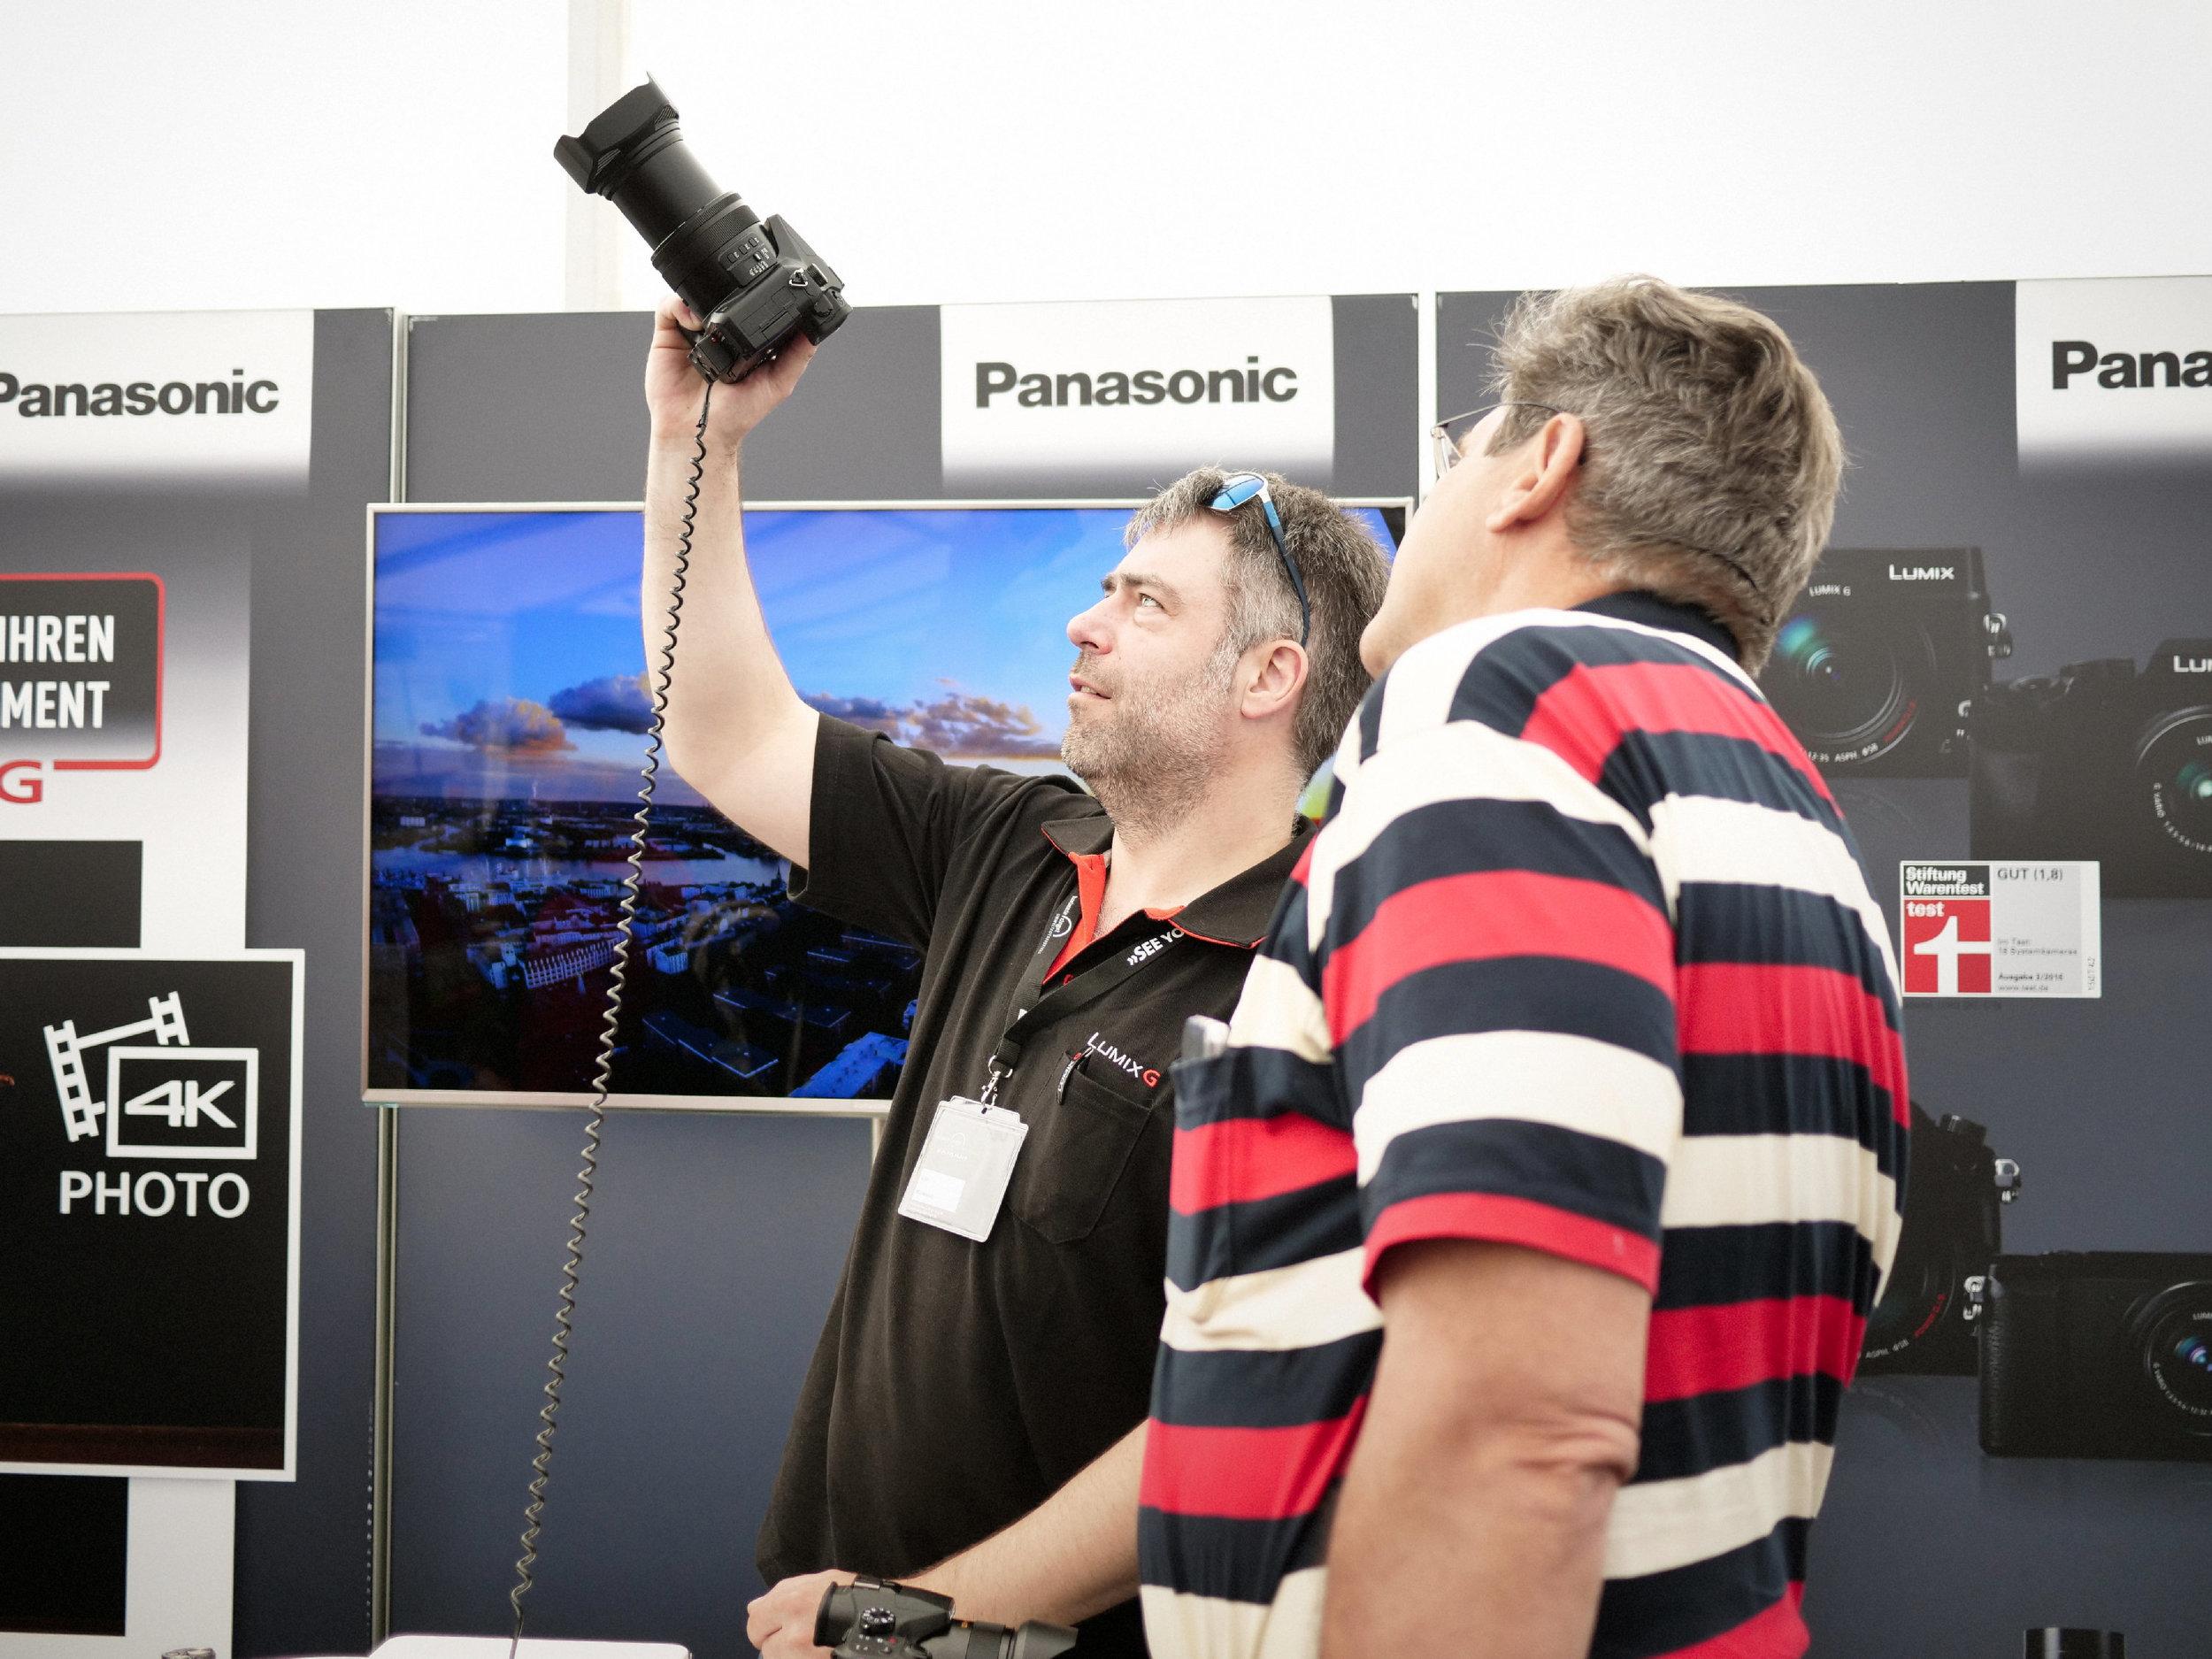 P1000246_Exp2_Panasonic Lumix Workshop.jpg